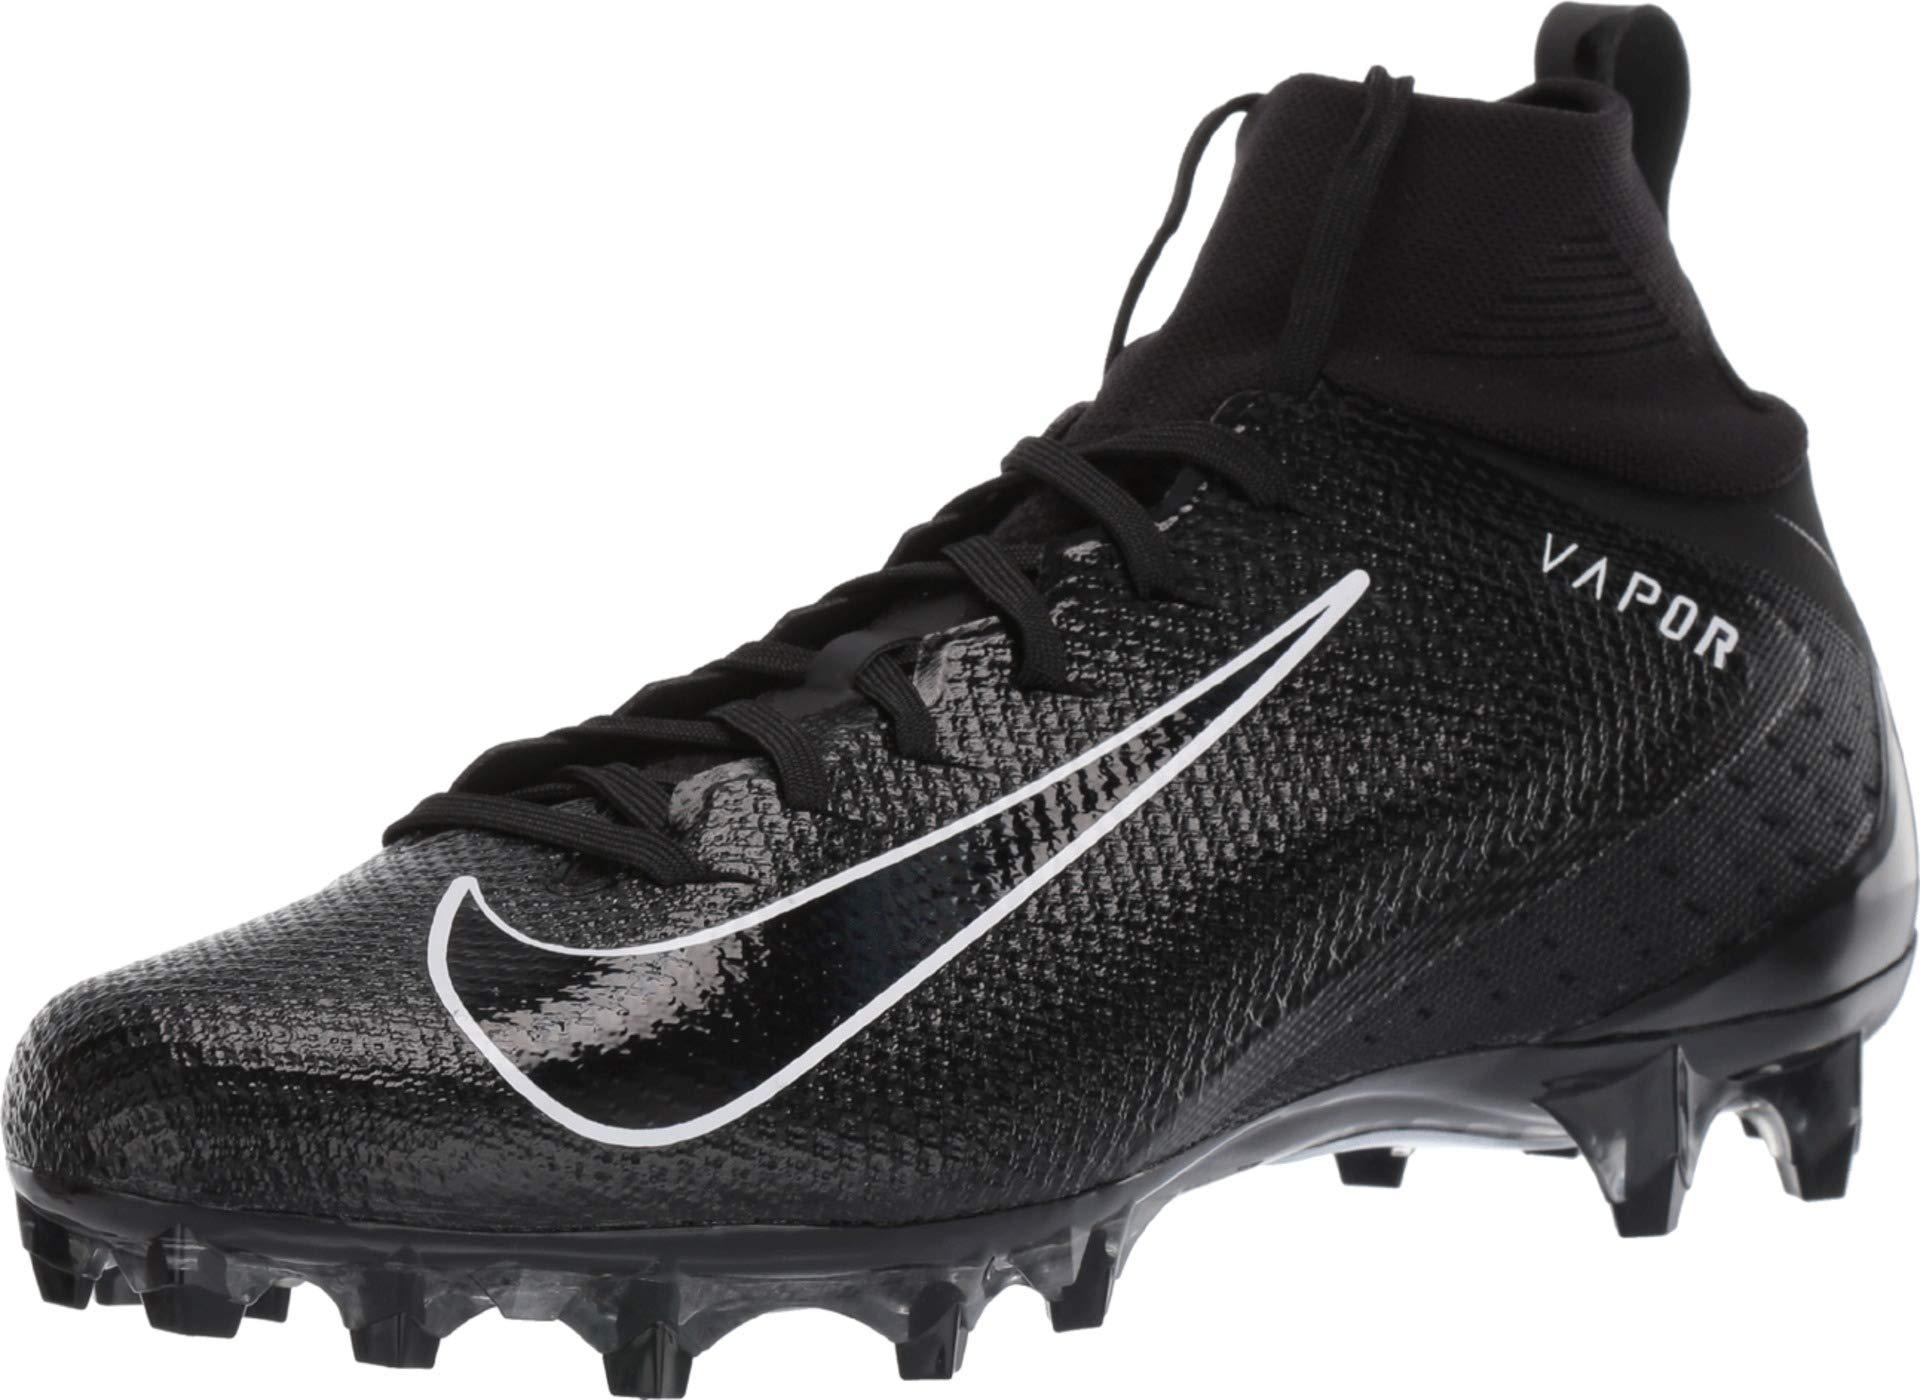 Nike Men's Vapor Untouchable Pro 3 Football Cleat Black/Anthracite Size 12 M US by Nike